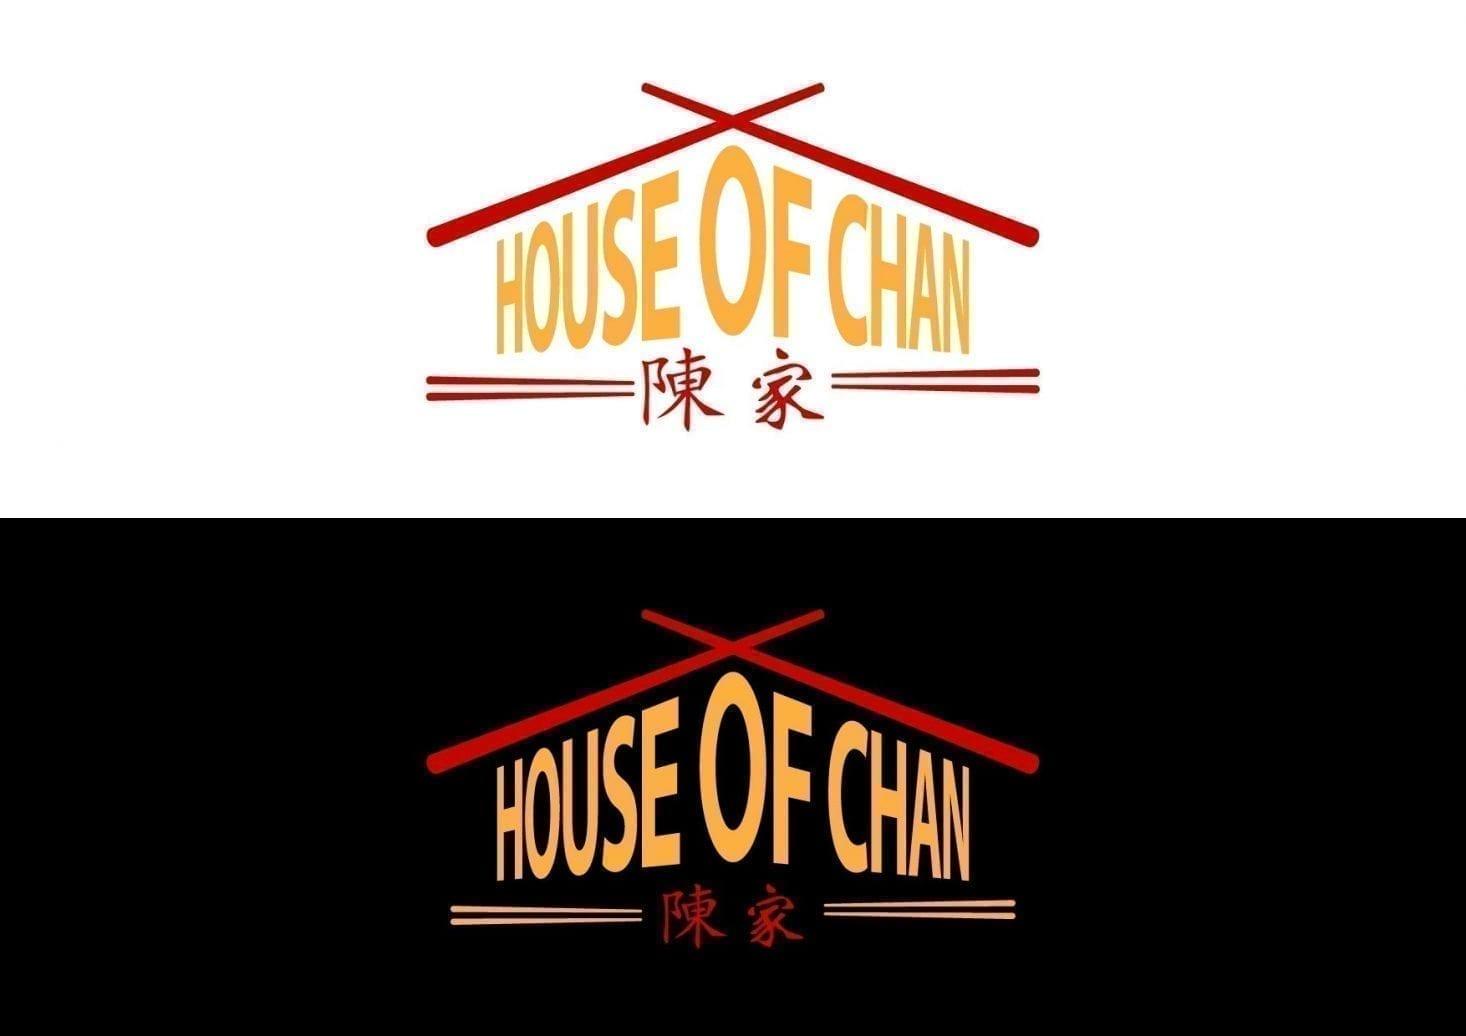 Chinese restaurant logo design ideas